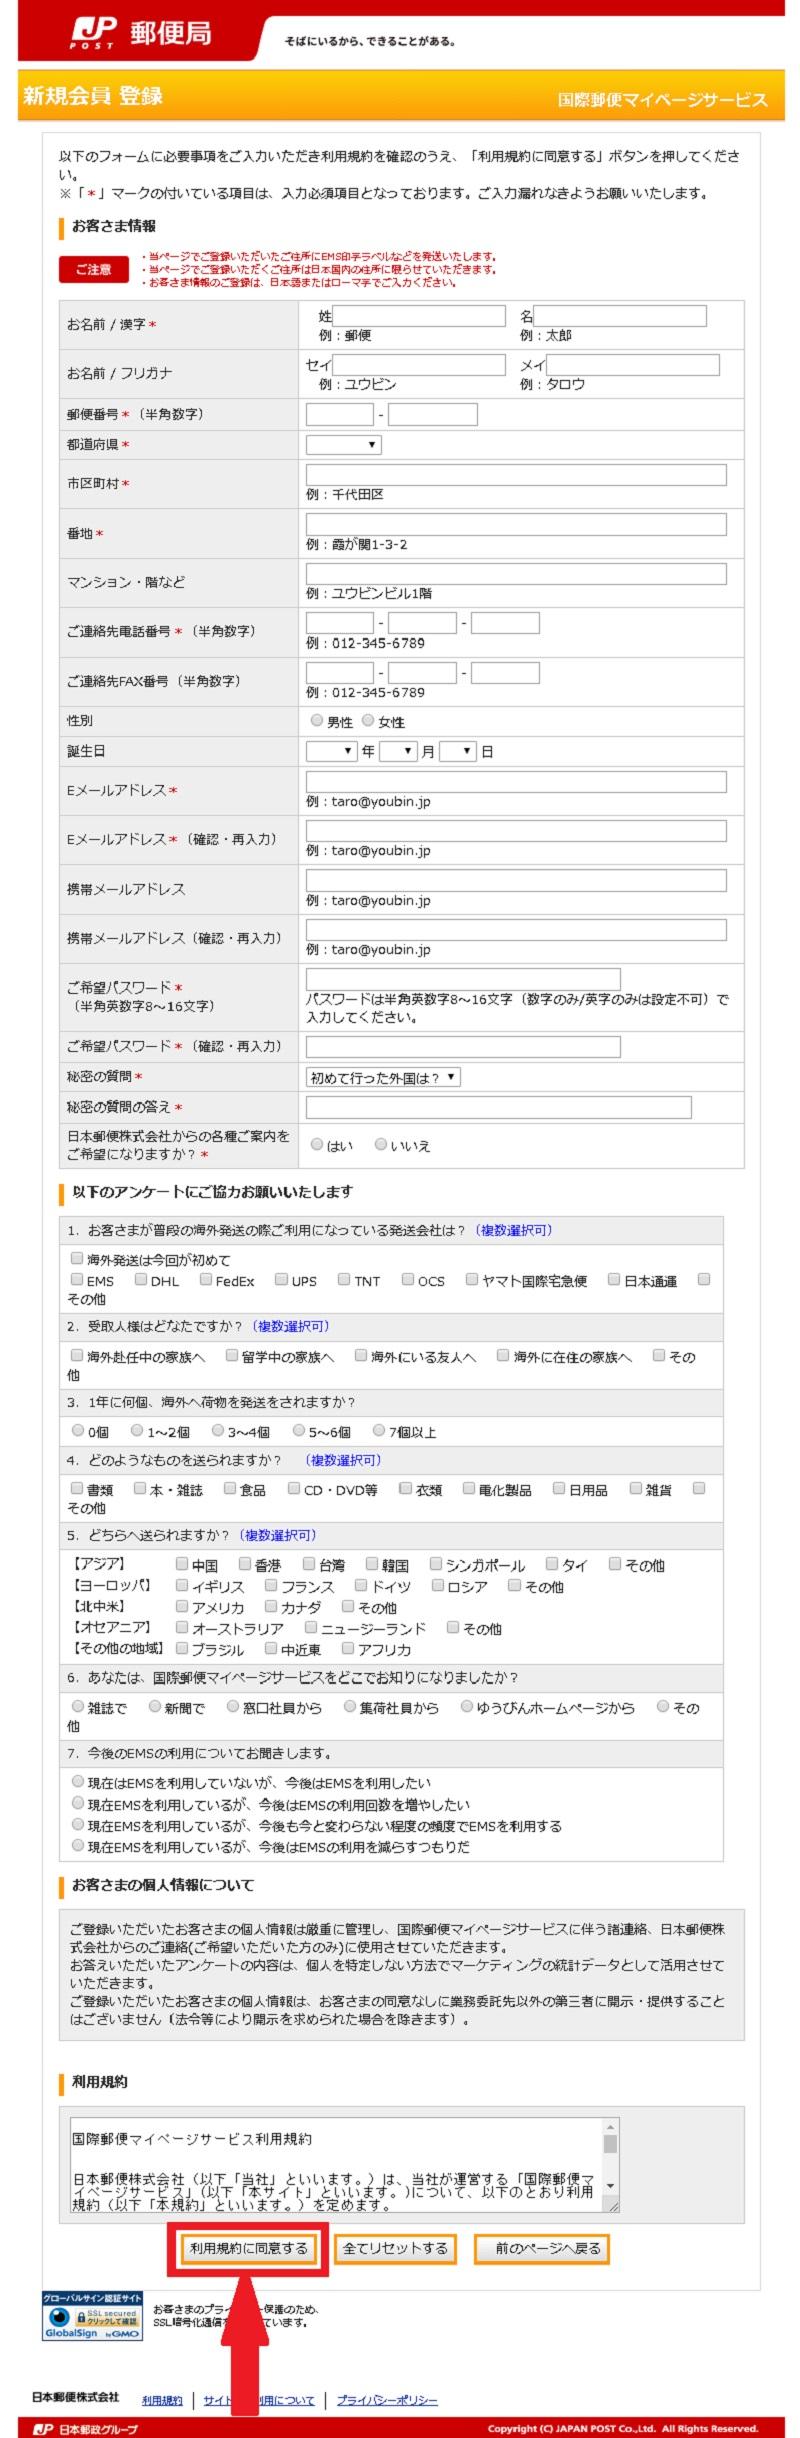 eBay輸出知っ品ツールの使い方、国際郵便マイページサービスの登録方法